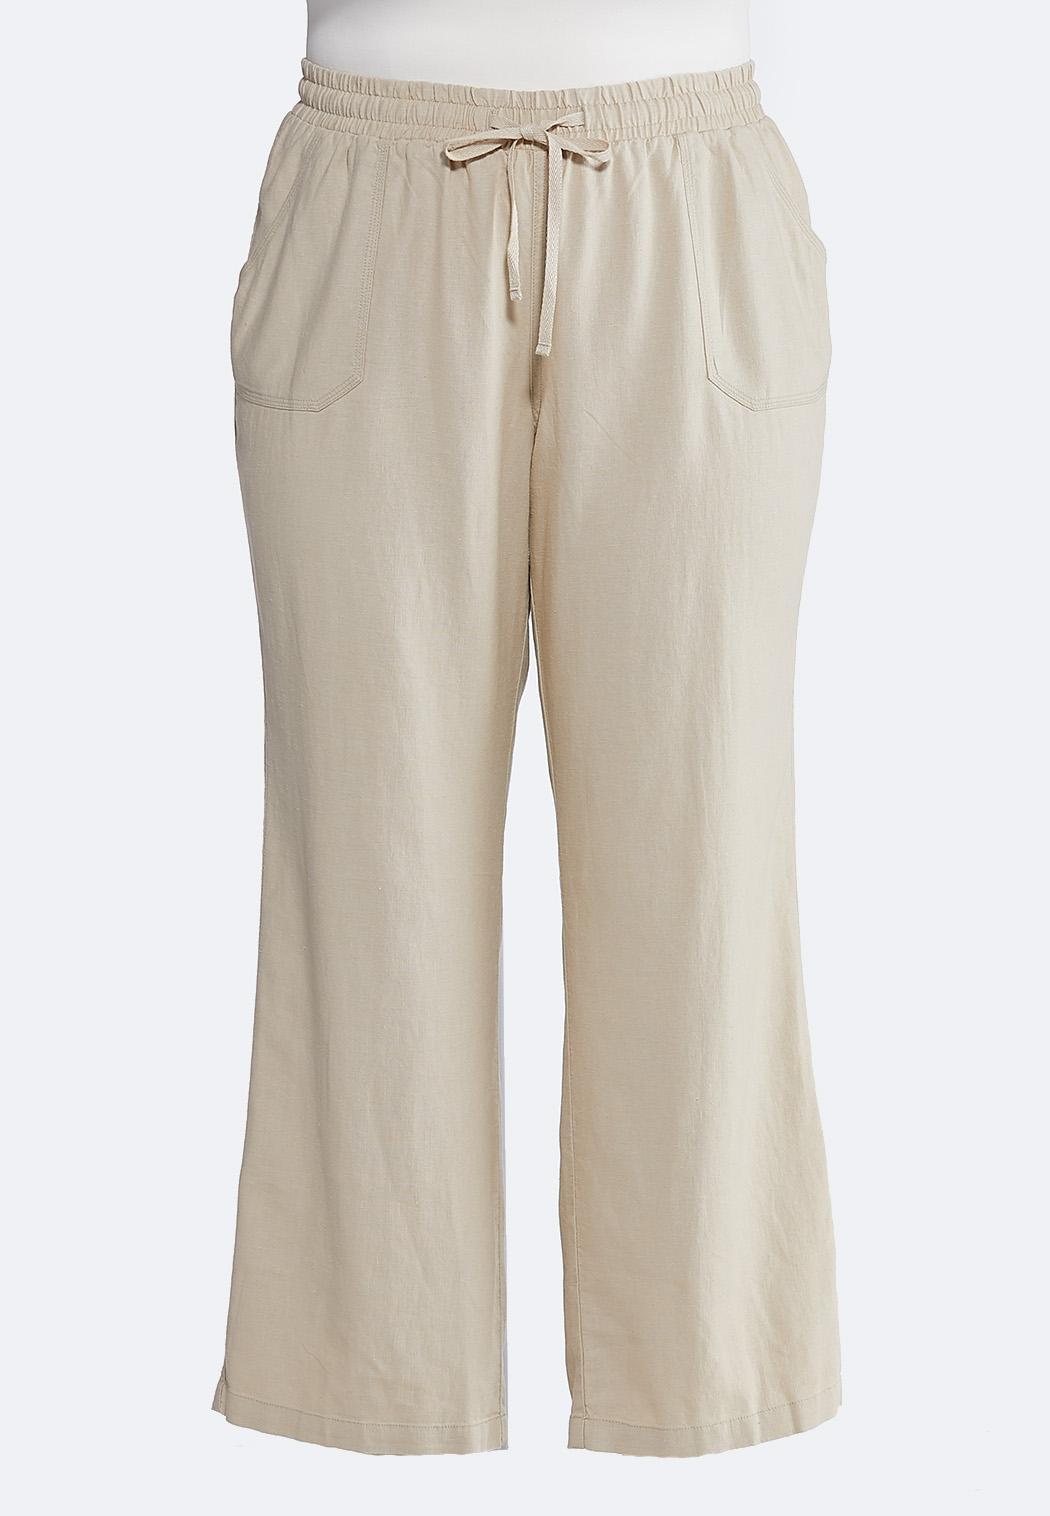 Plus Size Drawstring Linen Pants Pants Cato Fashions